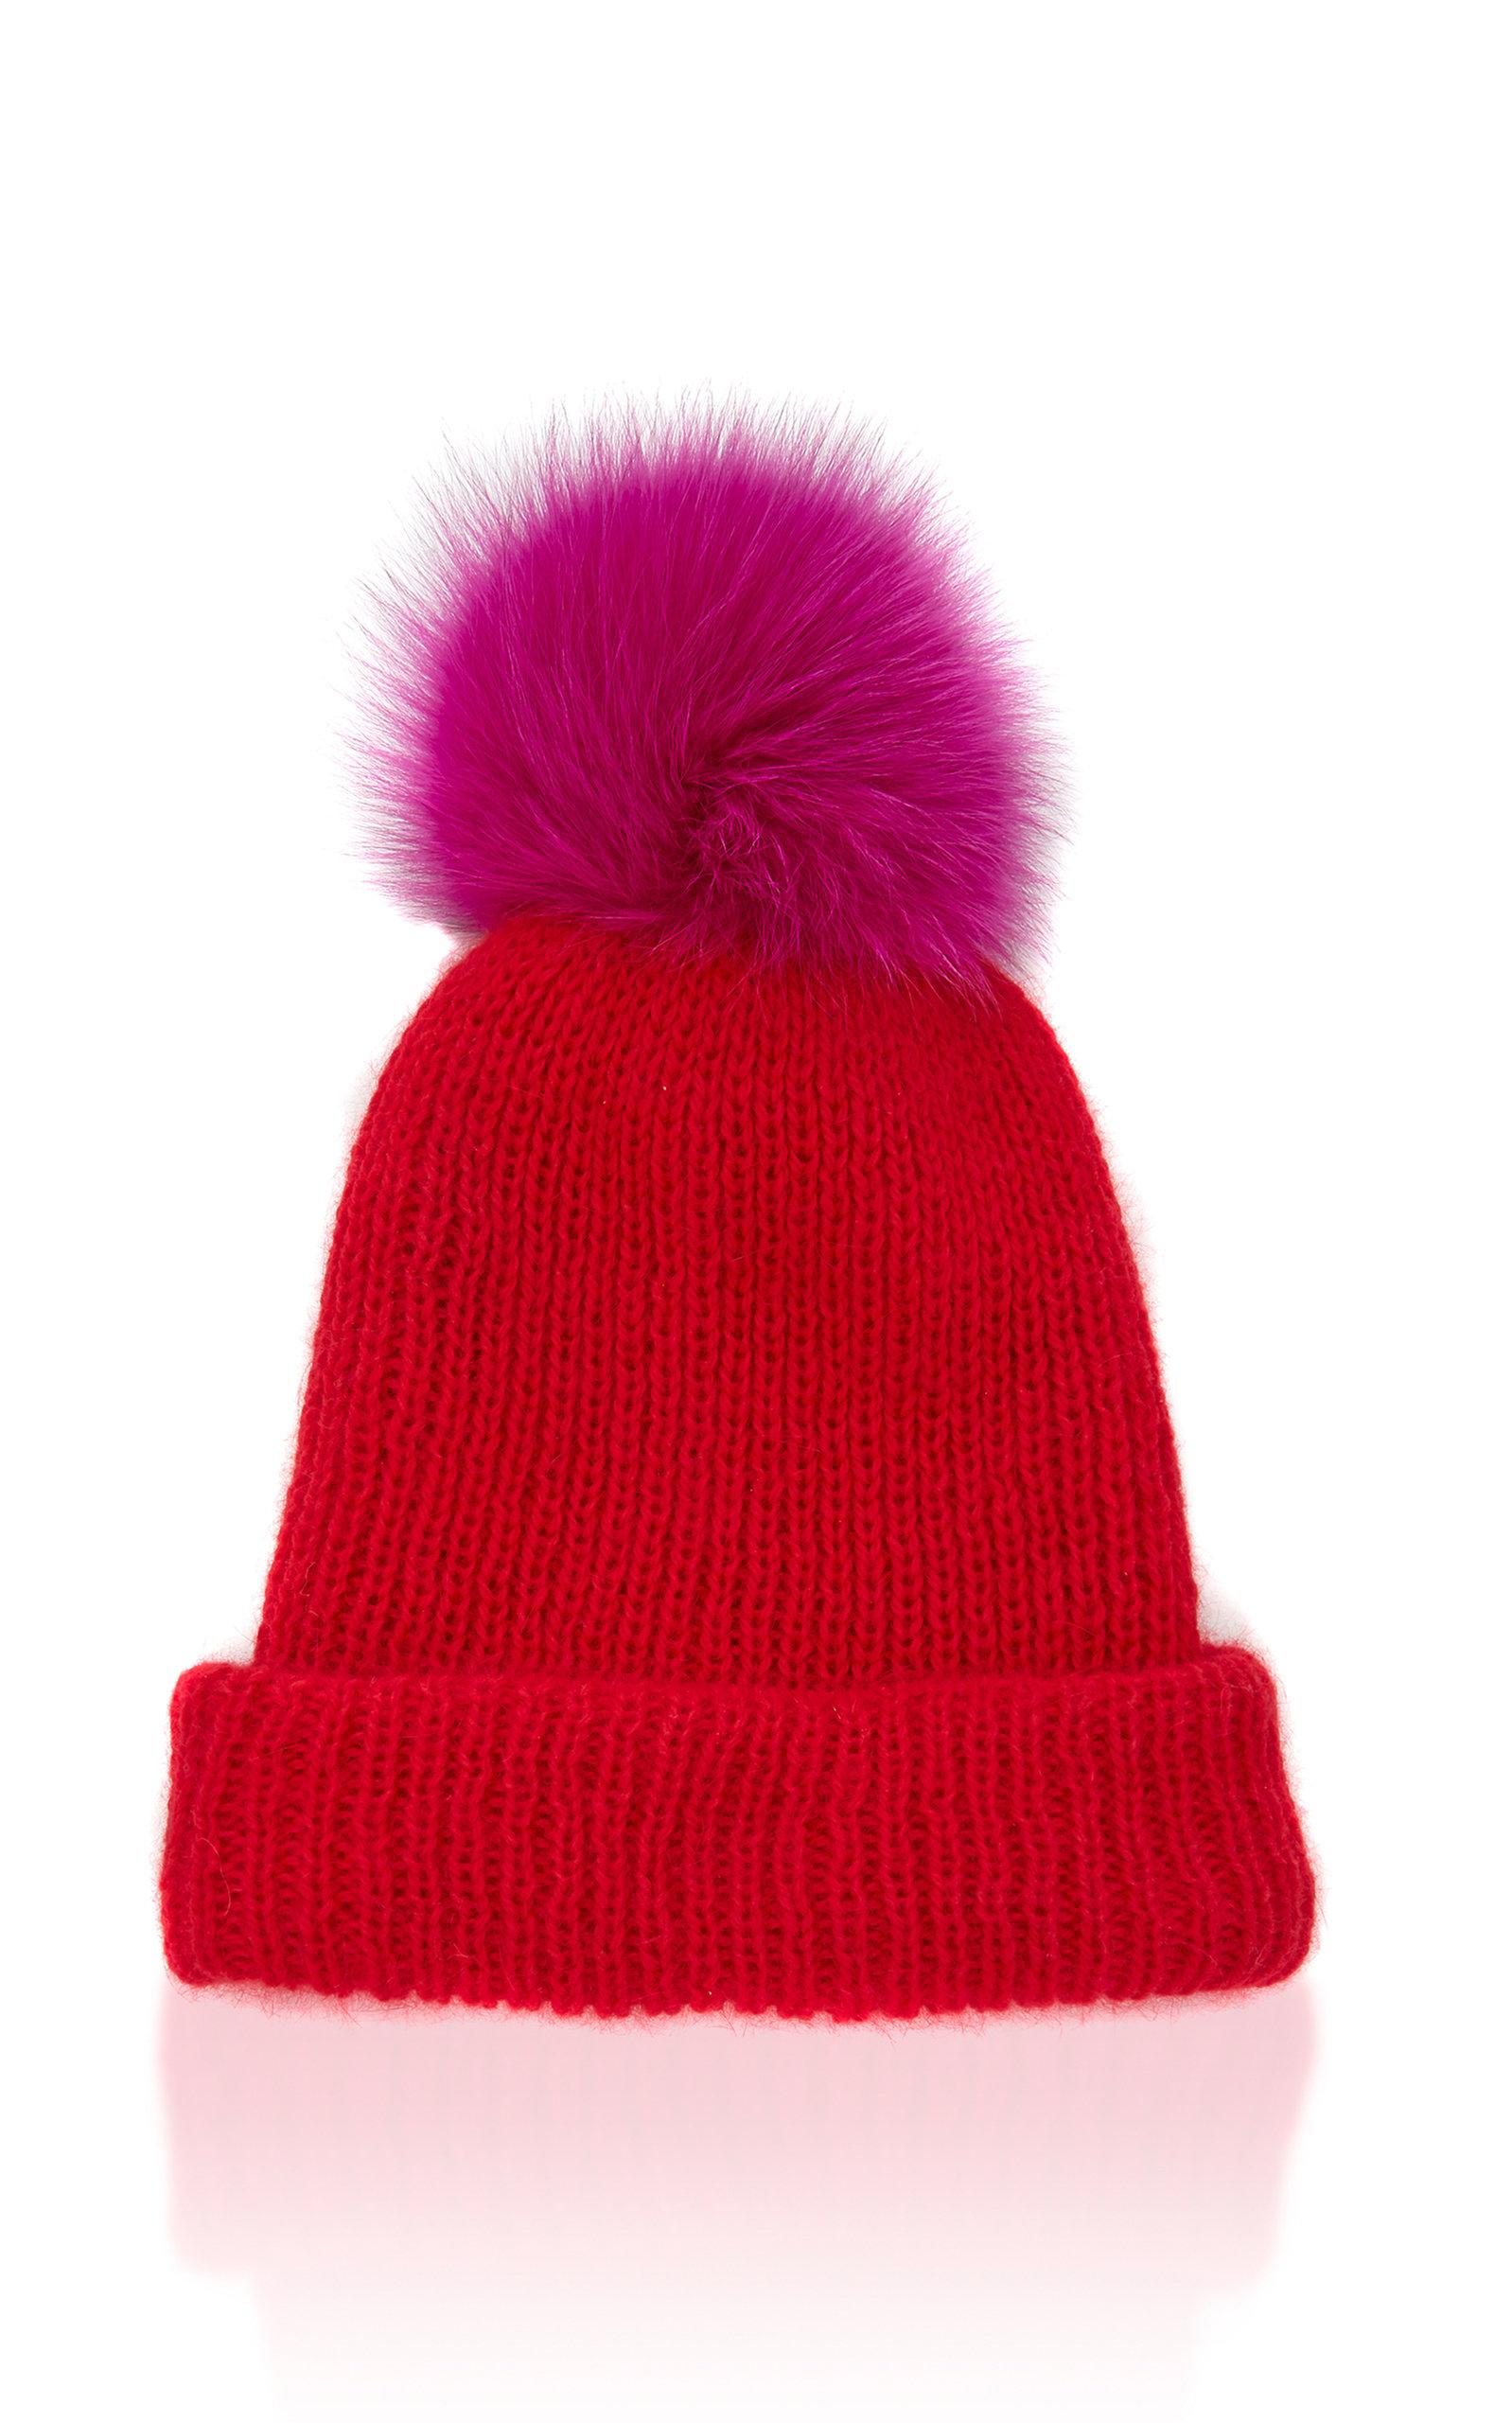 Faux Fur Pom Pom Hat in Red